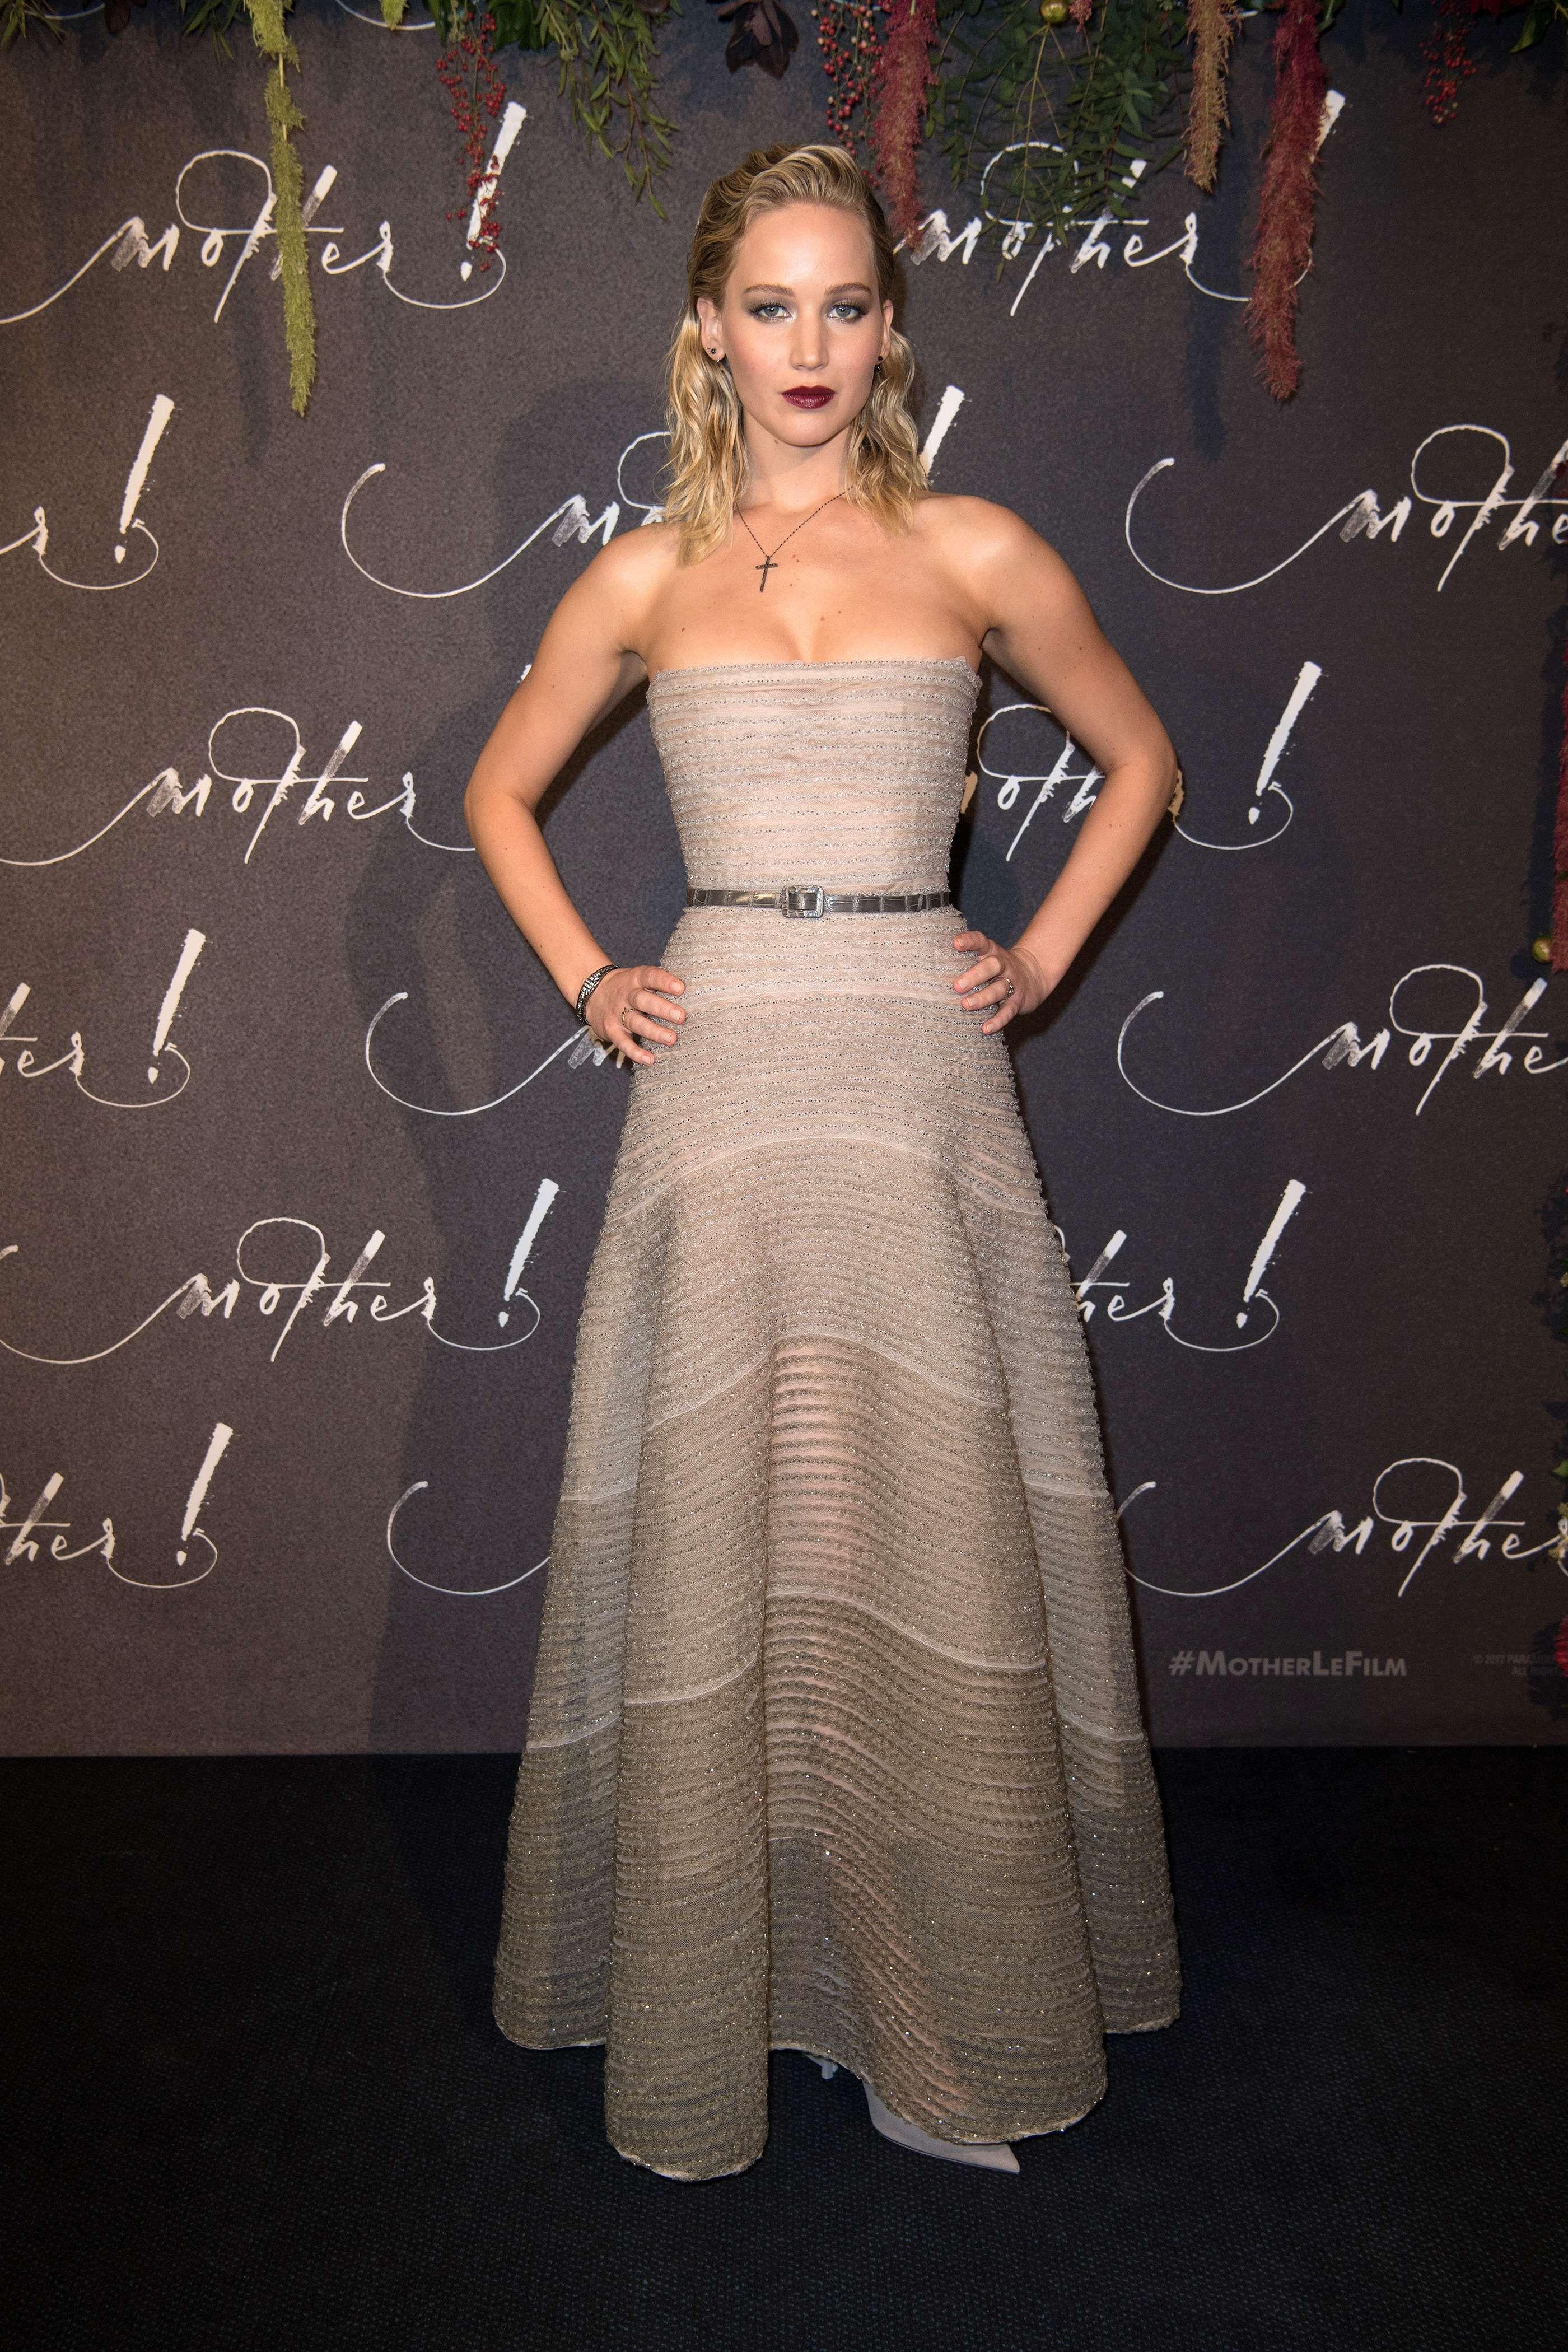 Jennifer-Lawrence-Sexy-29-thefappeningblog.com_-2.jpg